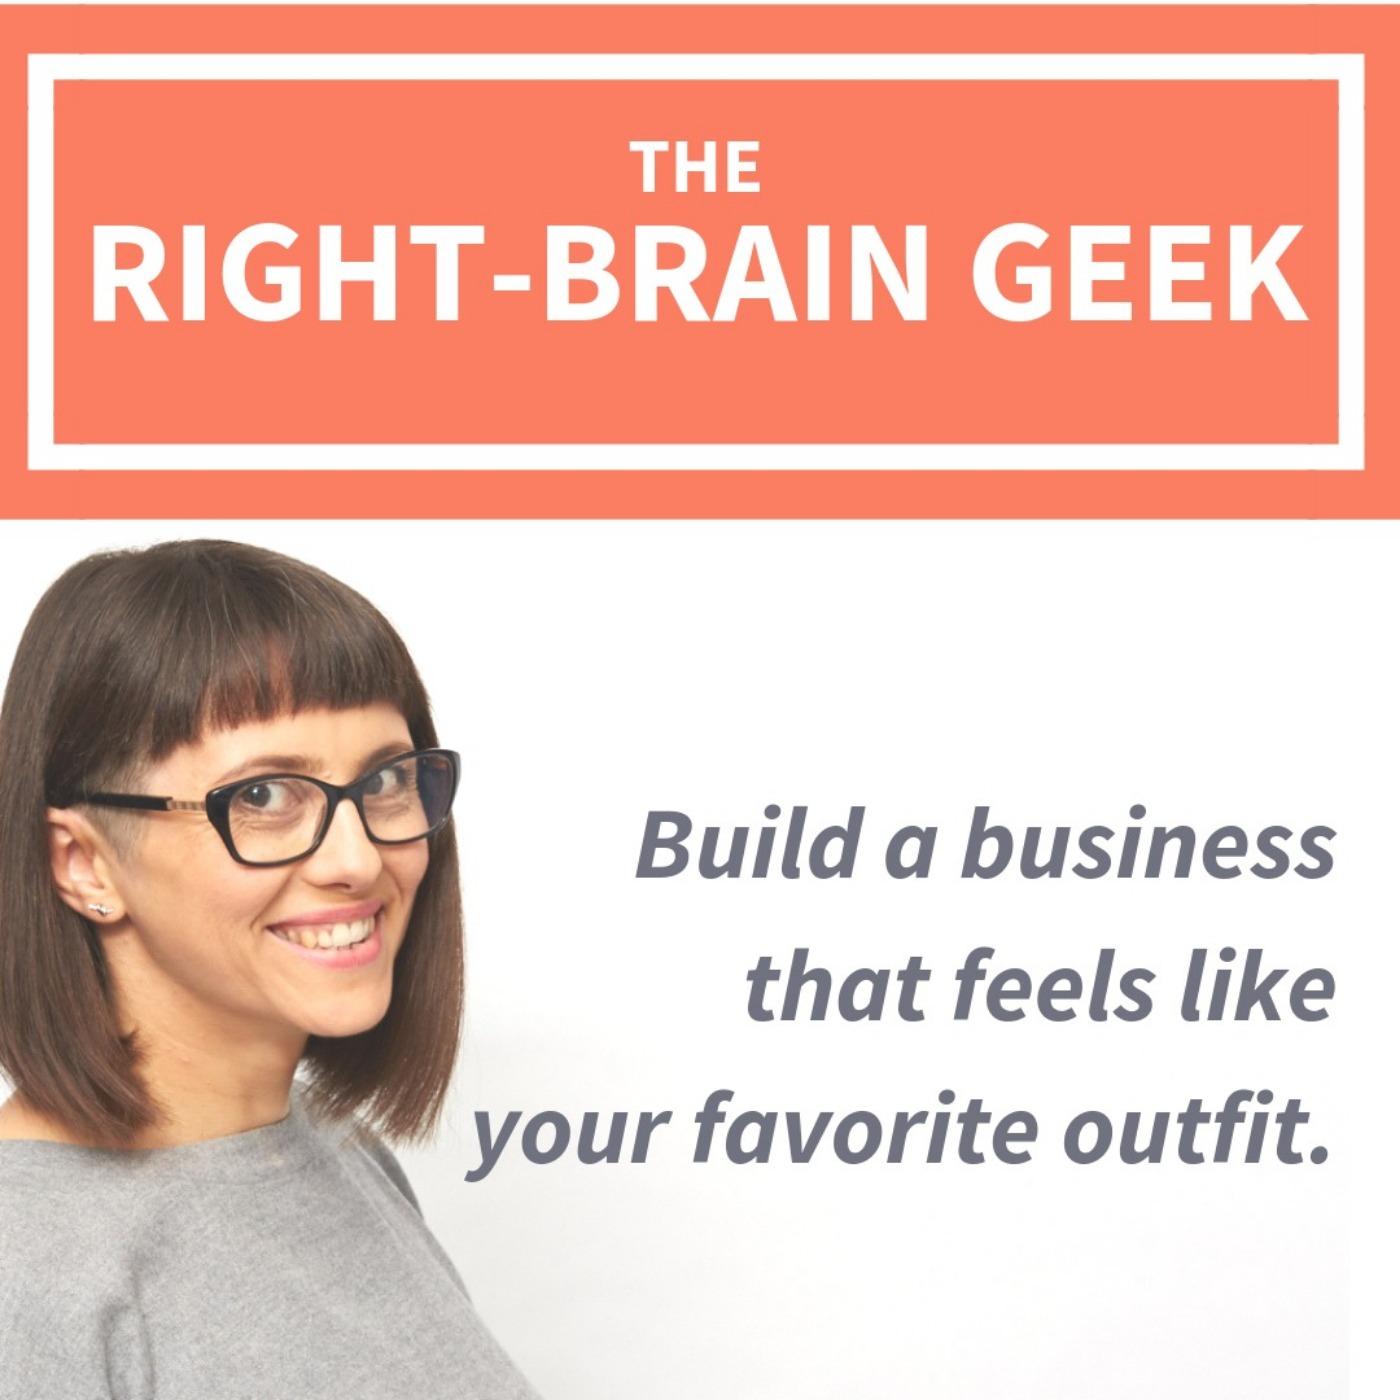 The Right-Brain Geek